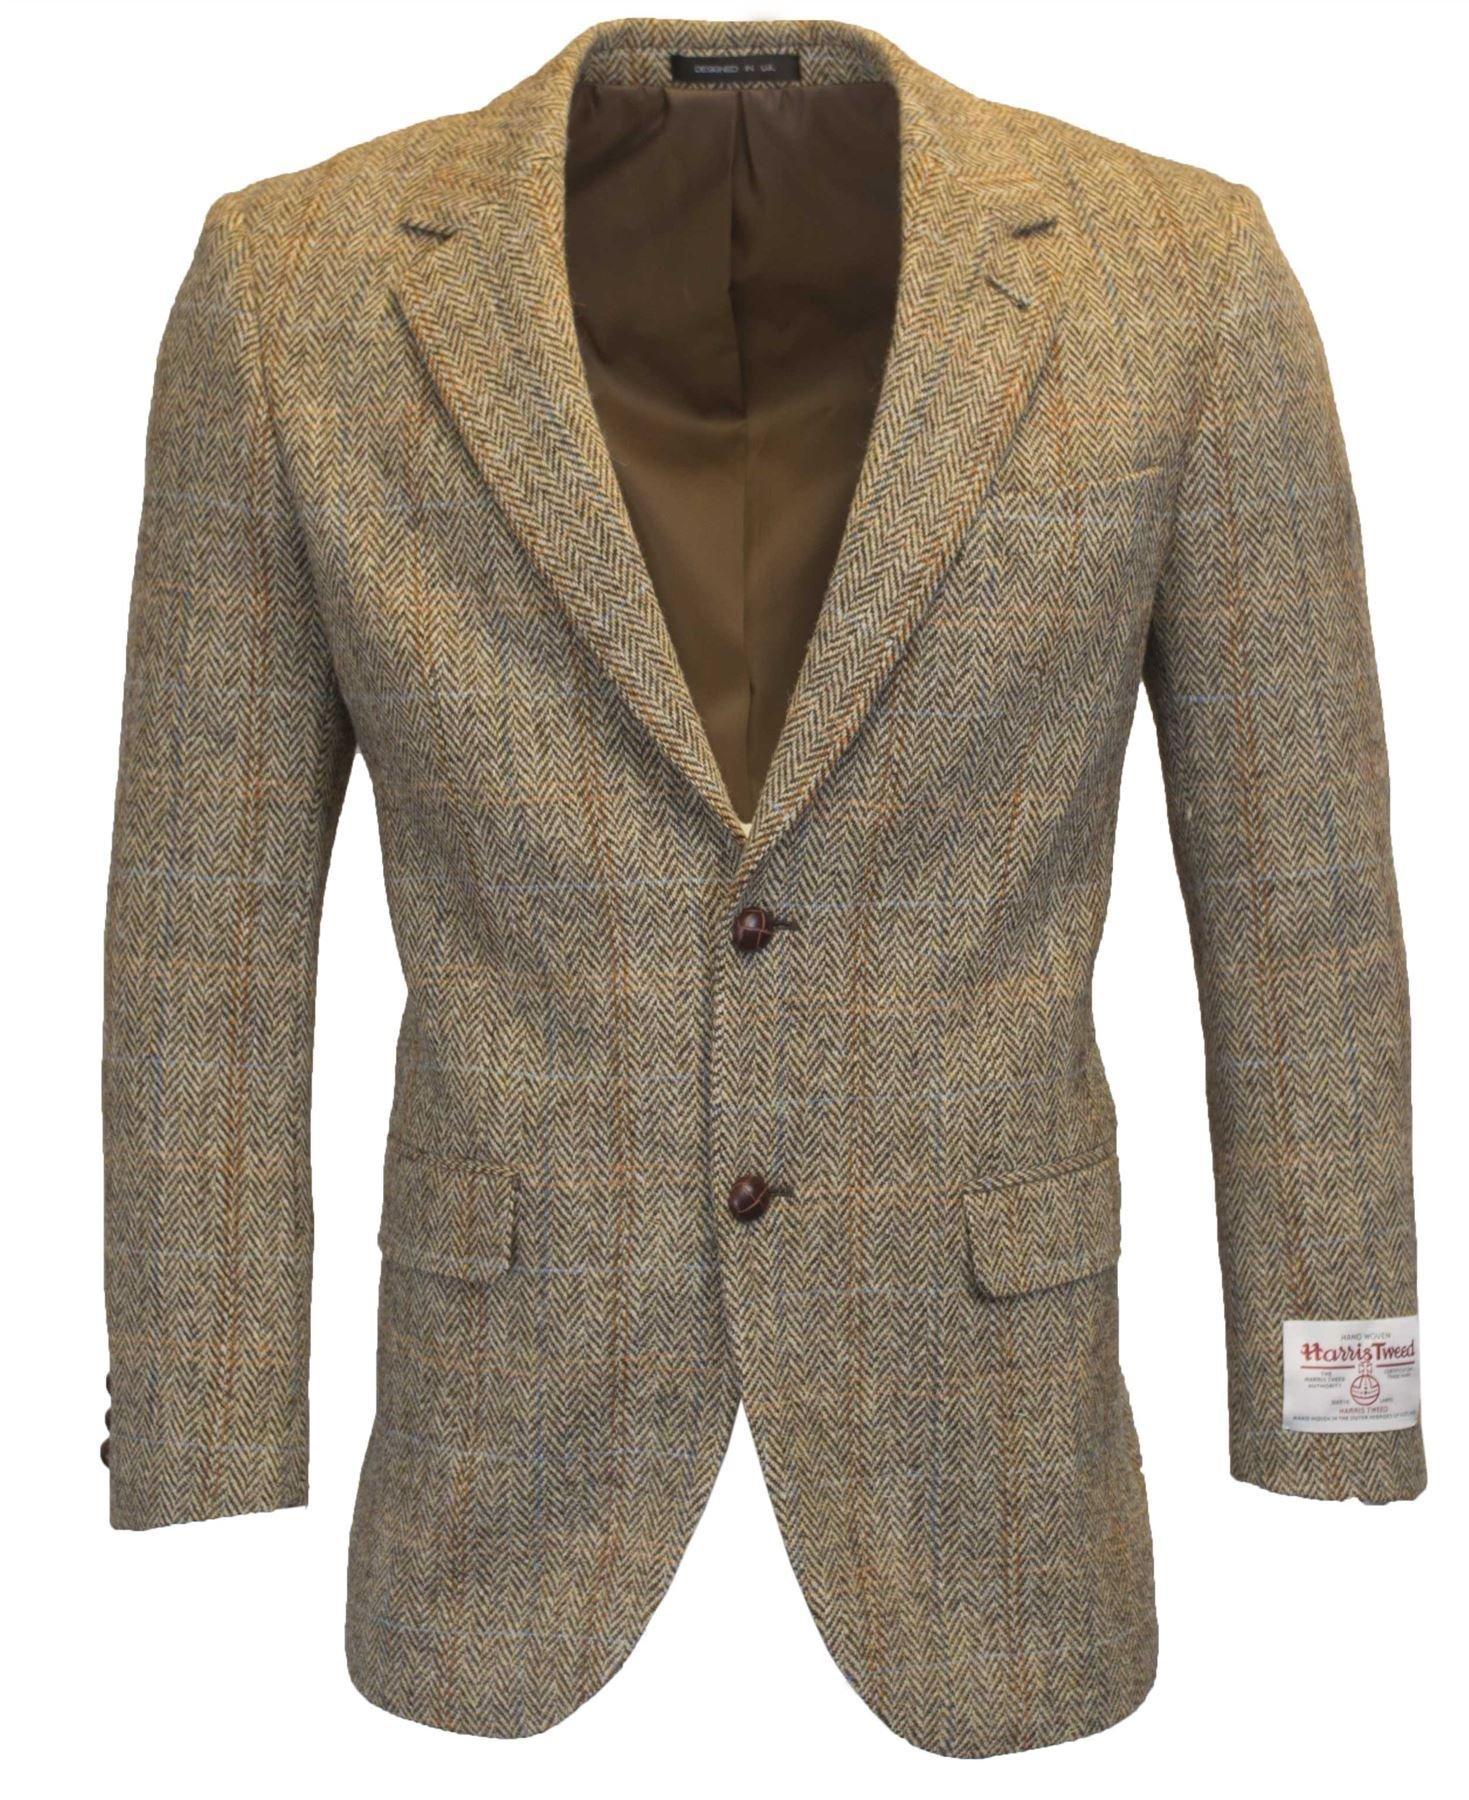 Walker & Hawkes - Mens Classic Scottish Harris Tweed Herringbone Overcheck Country Blazer Jacket - White Sand - 48 by Walker and Hawkes